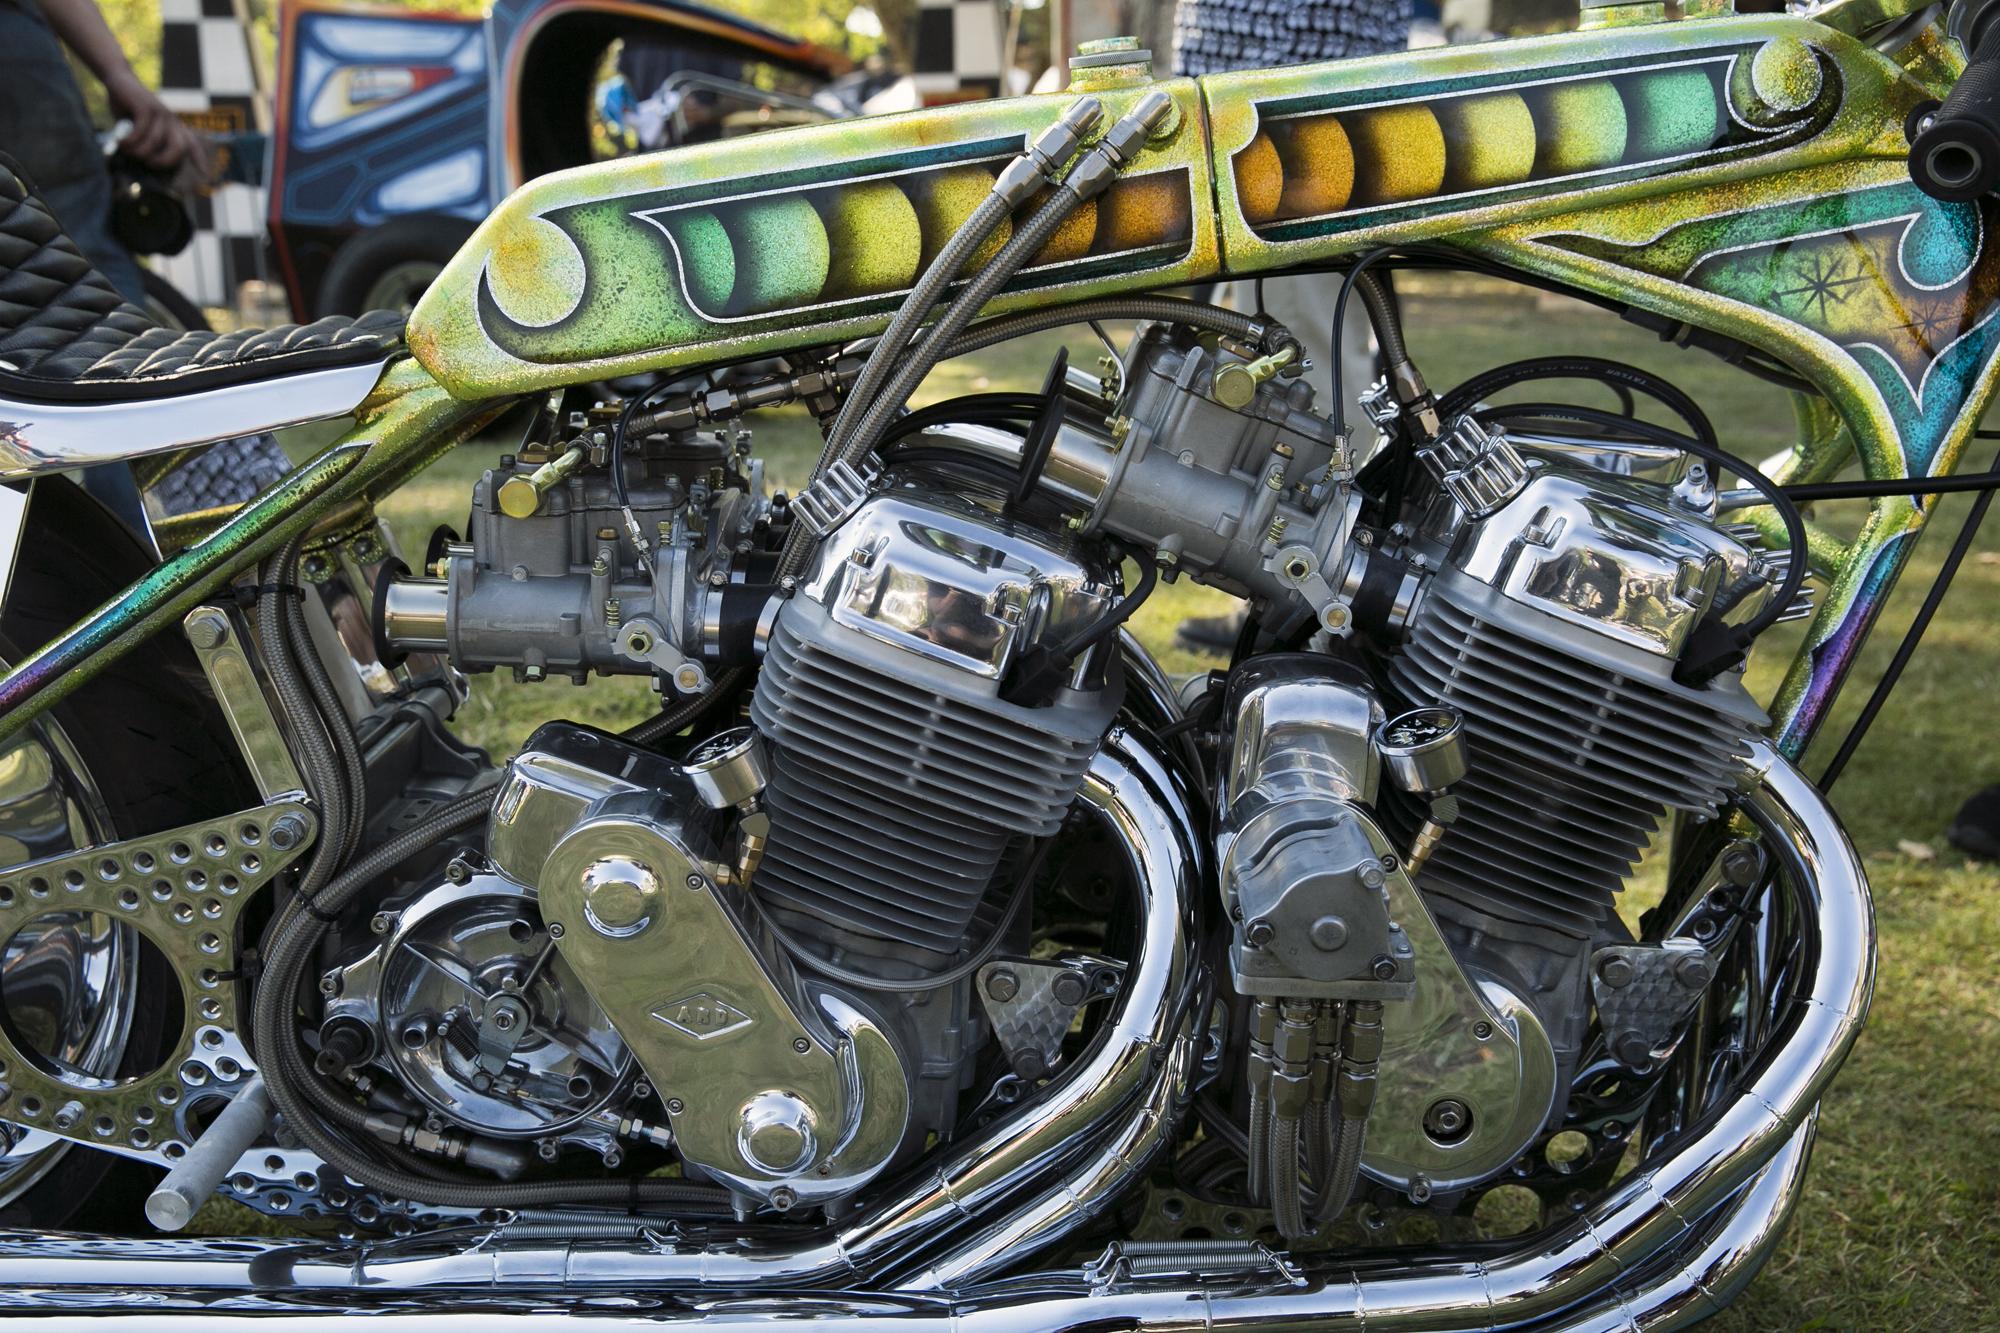 Born Free 8 Motorcycle Show-088.jpg